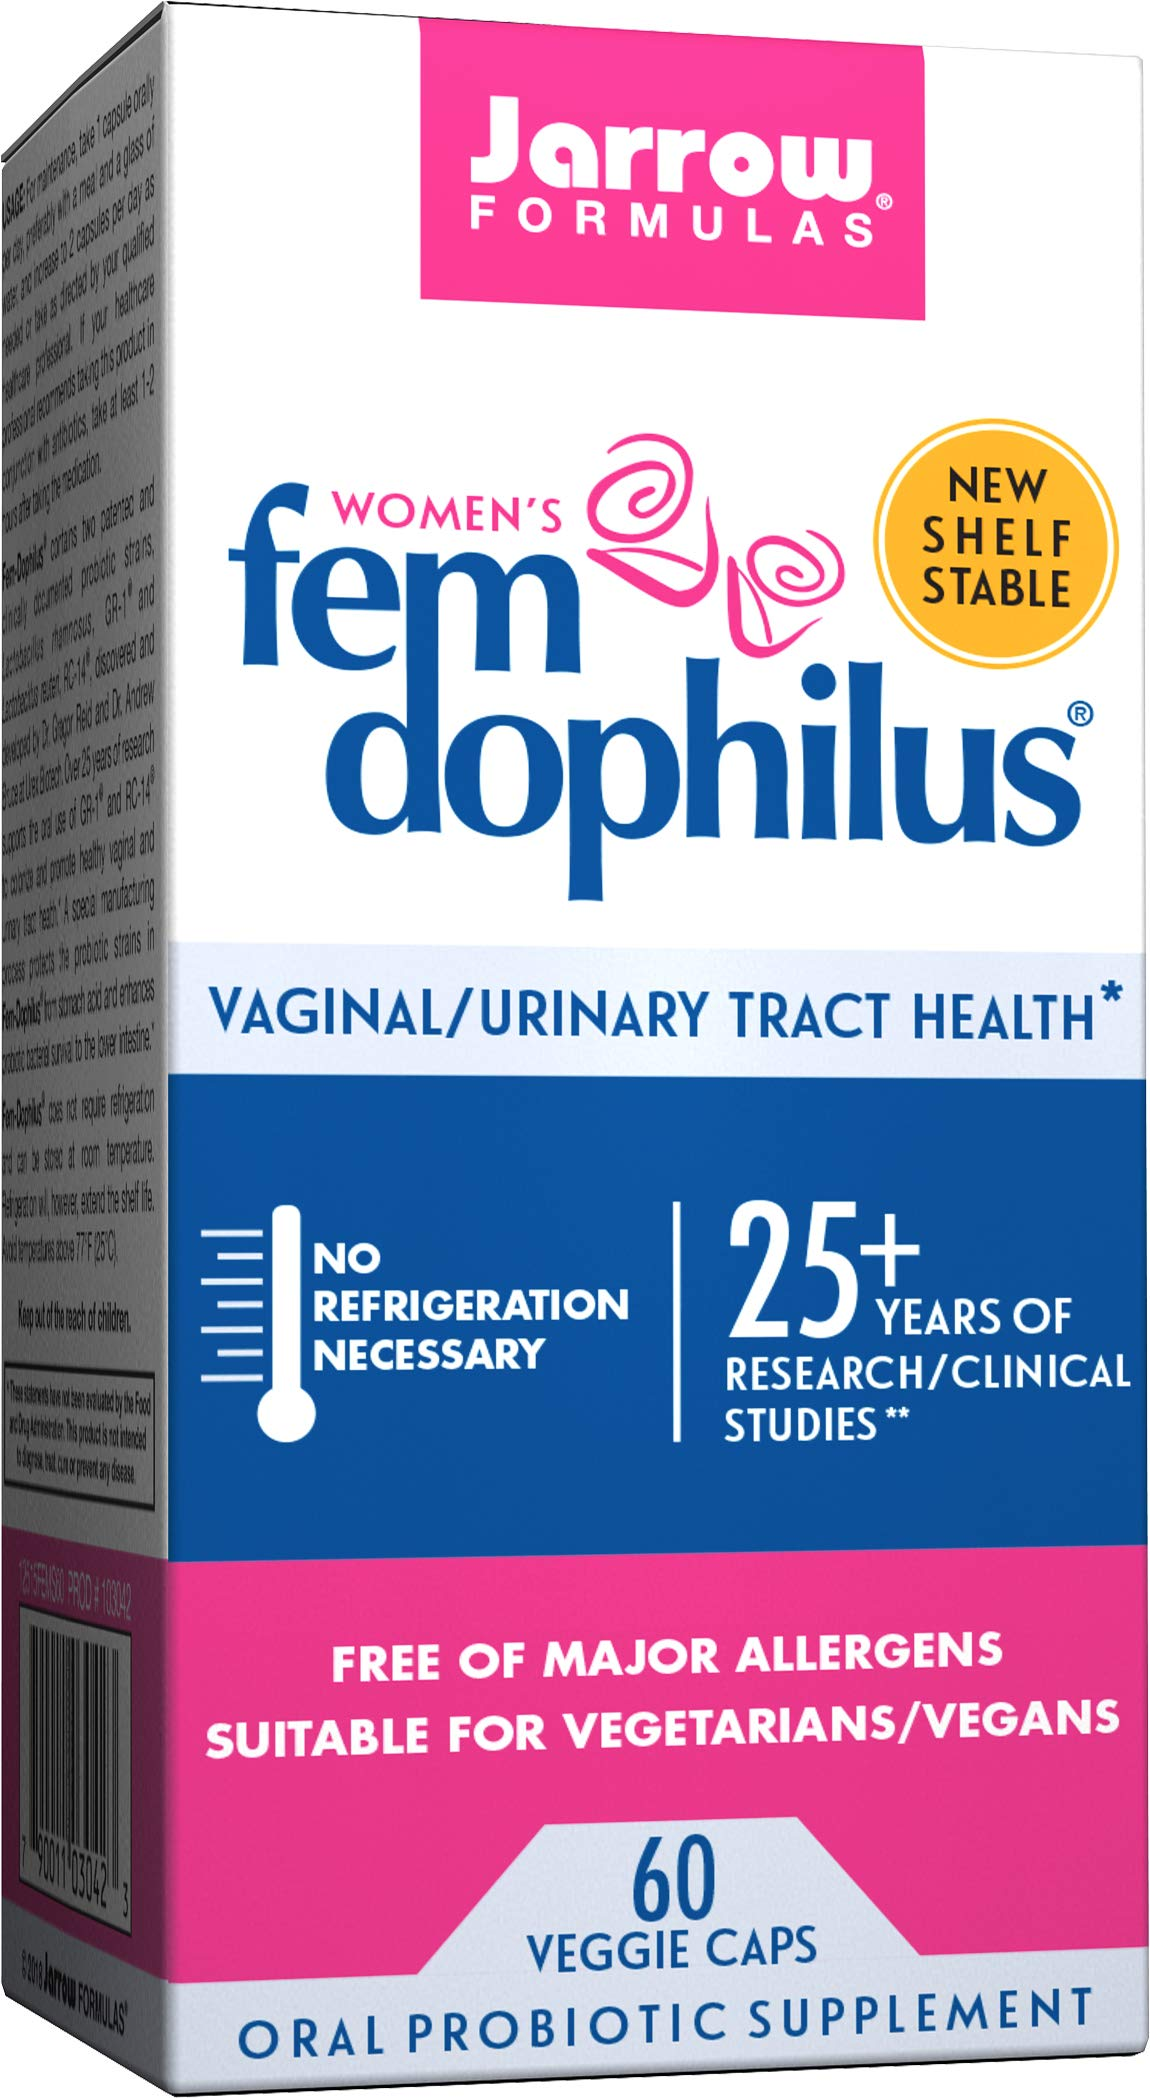 Jarrow Formulas Shelf-Stable Fem-Dophilus, 1 Billion Organisms Per Capsule, Supports Vaginal and Urinary Tract Health, 60 Capsules by Jarrow Formulas